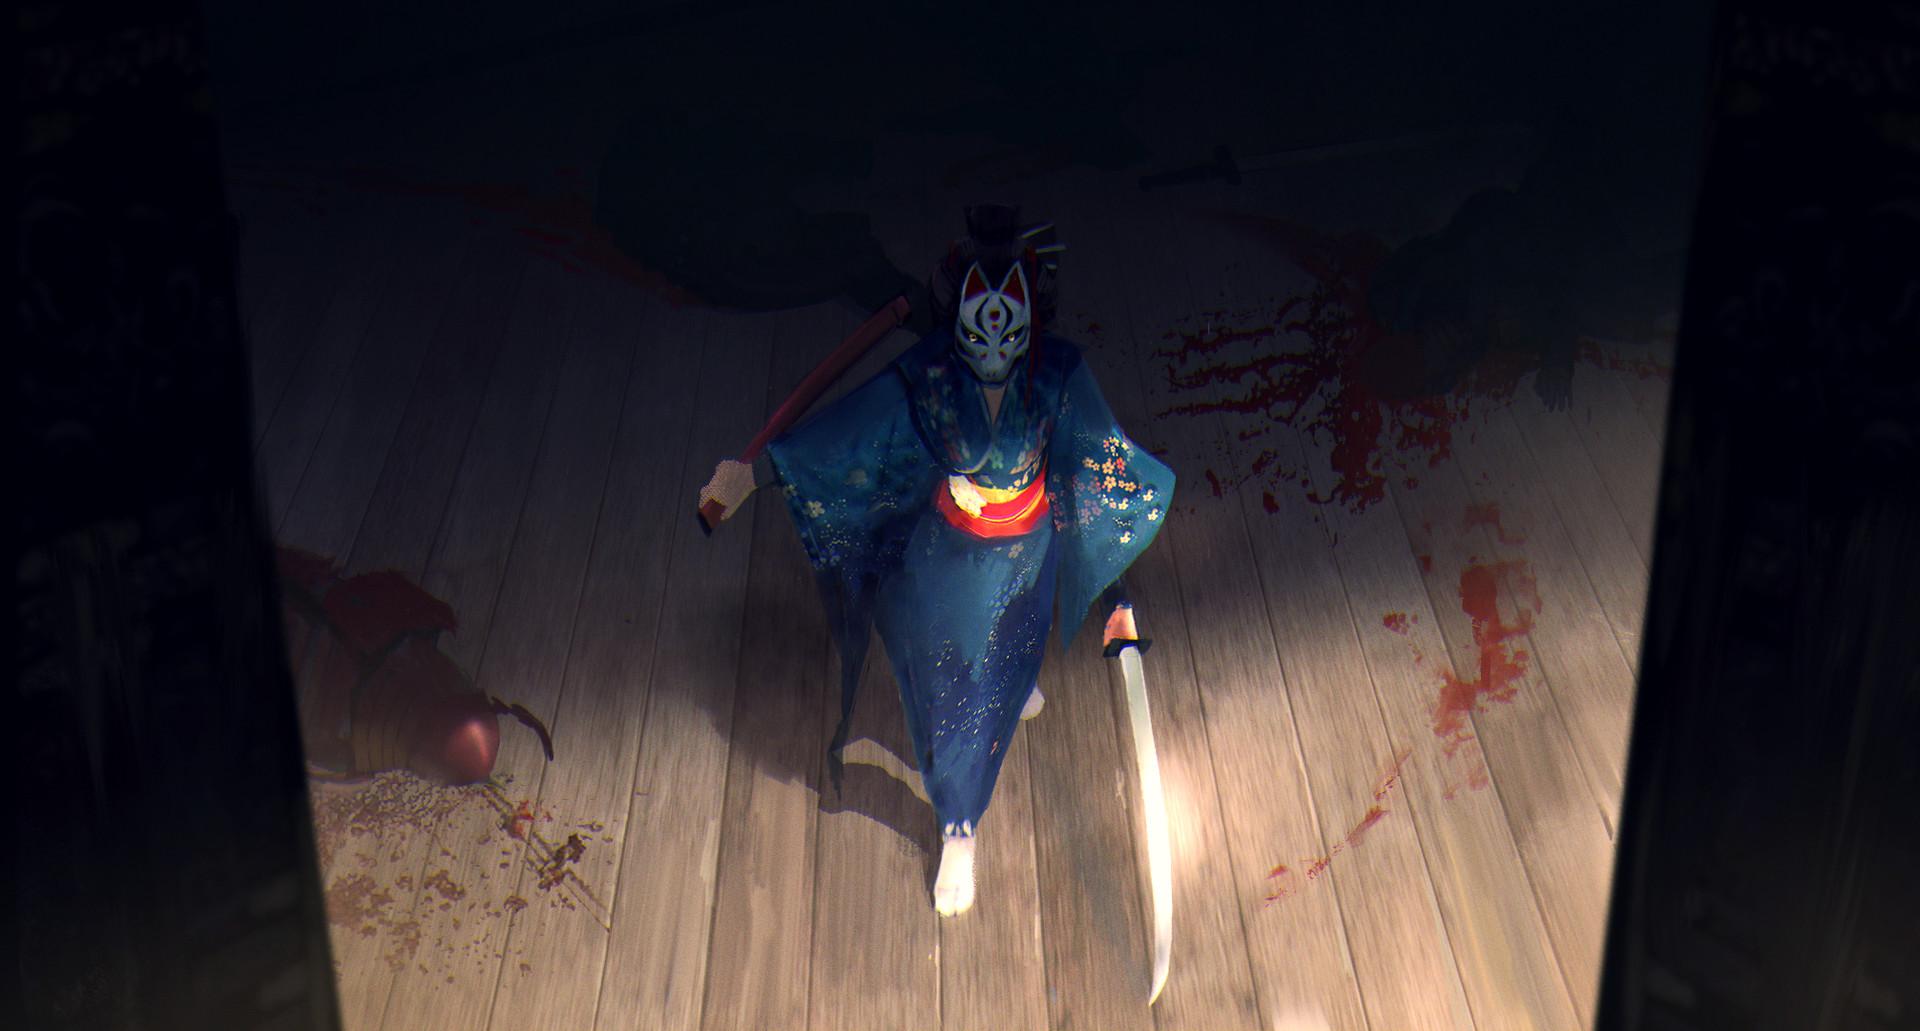 General 1920x1031 Japan fantasy art samurai armor weapon katana blood mask kimono Sangyeop Park